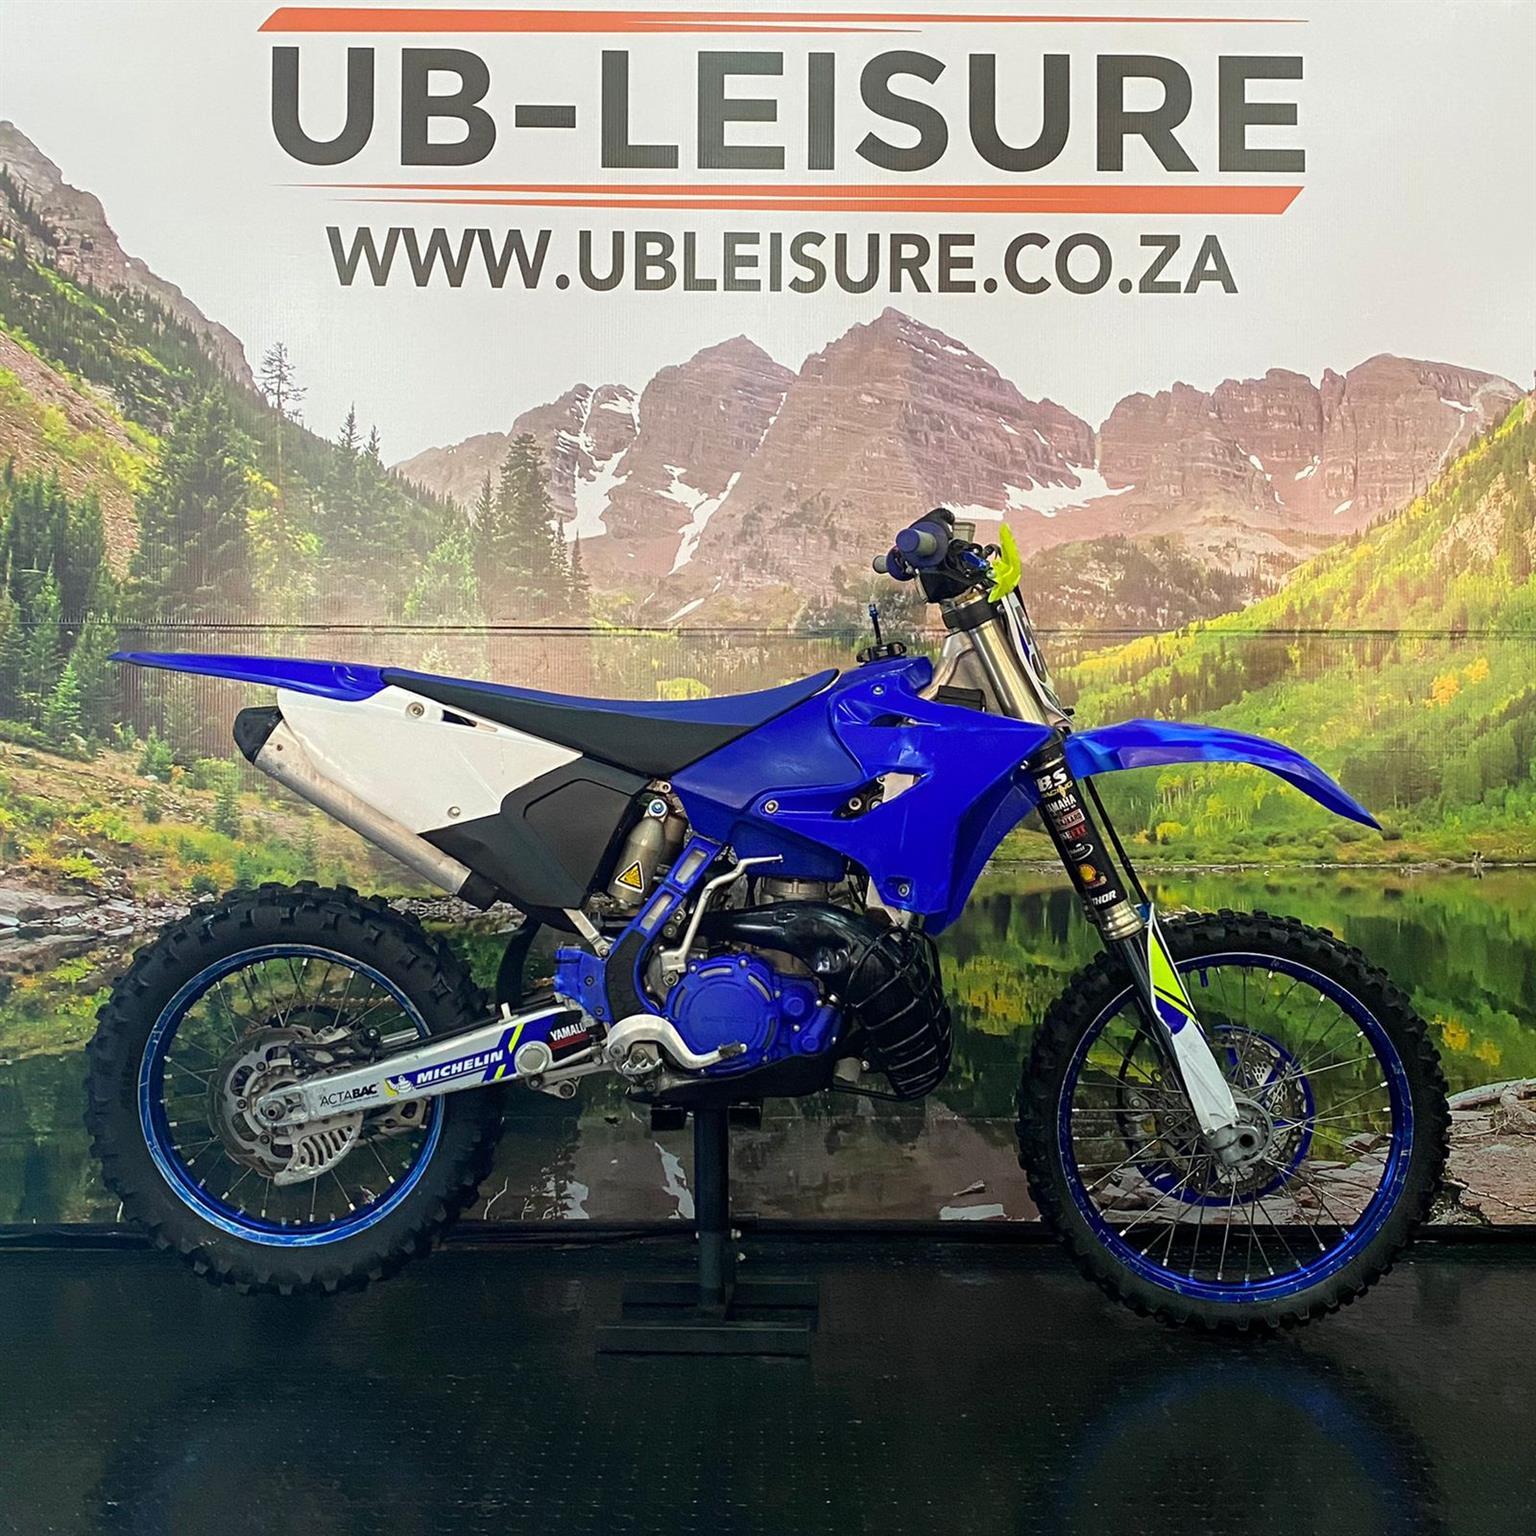 2019 YAMAHA YZ 250 X   UB LEISURE